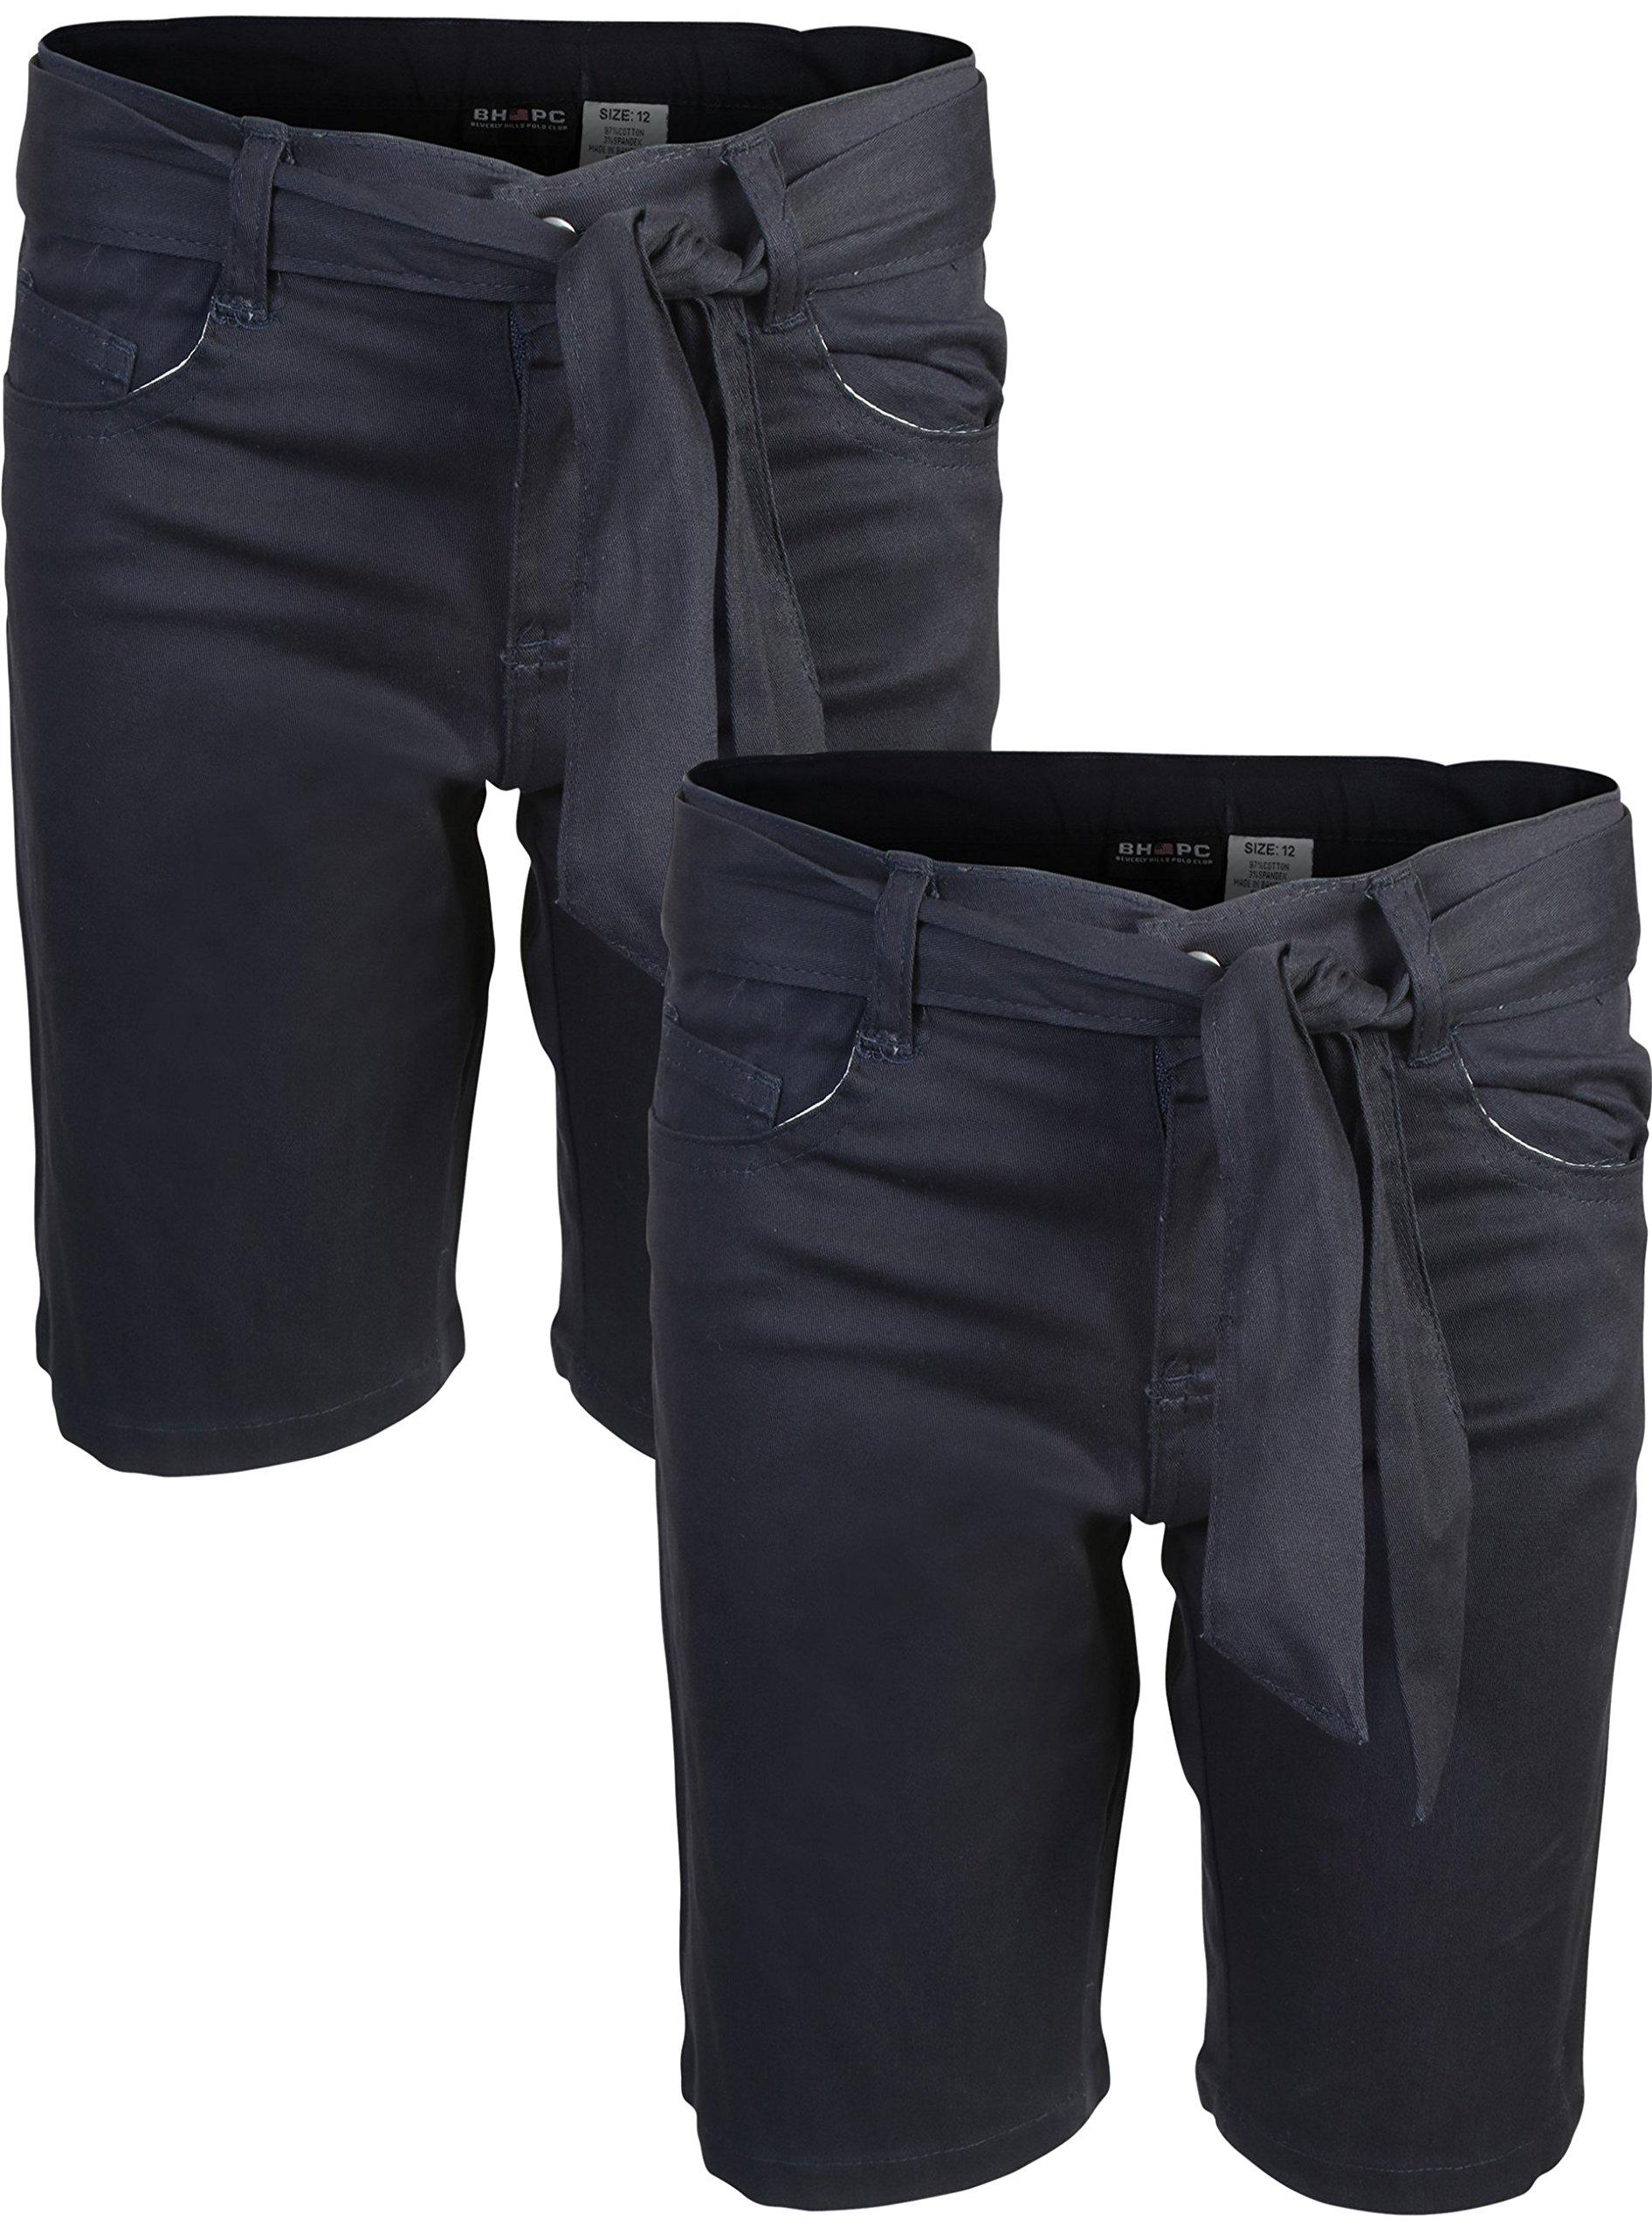 Beverly Hills Polo Club Girls School Uniform Belted Bermuda Shorts, Navy, Size 10'